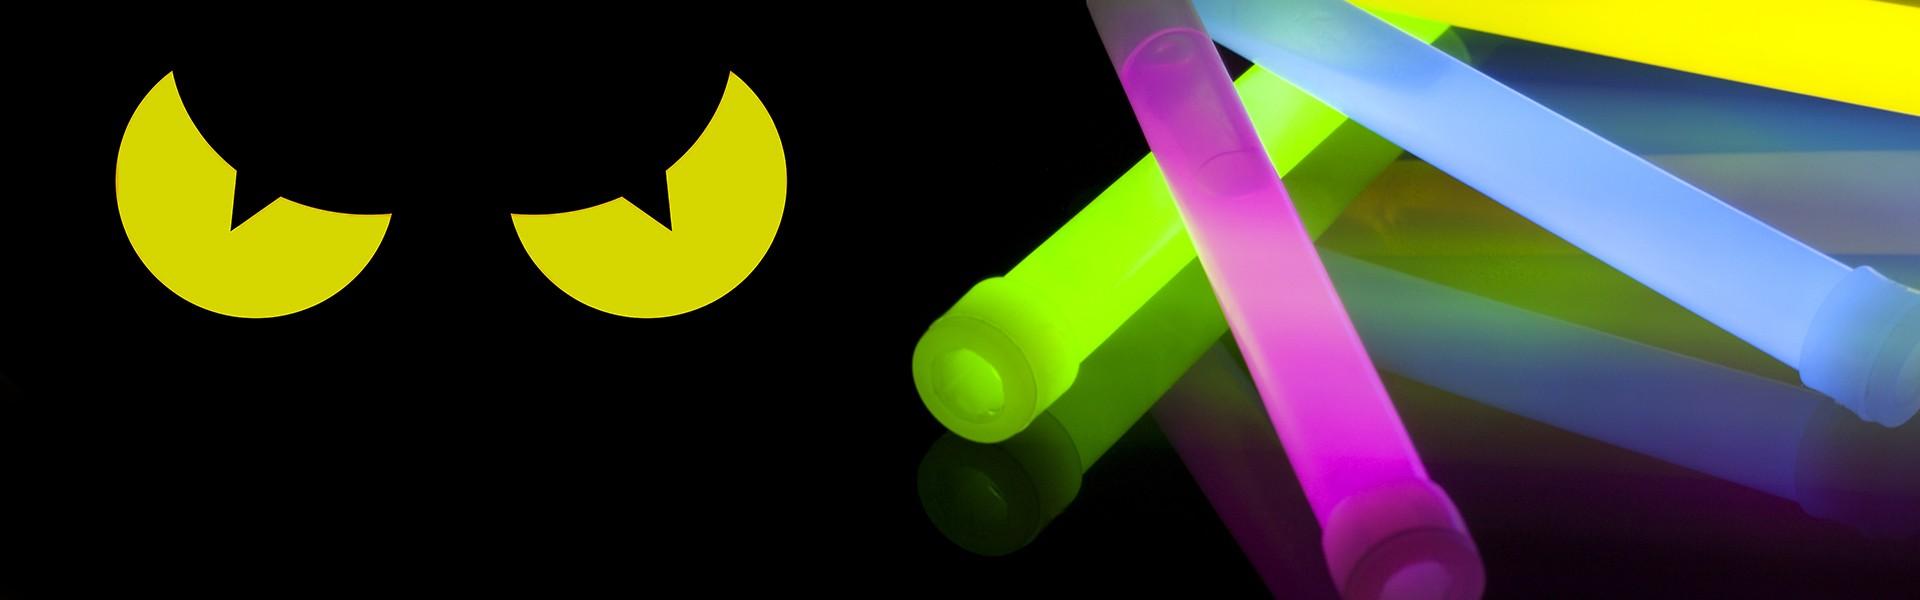 glow sticks for evil eyes